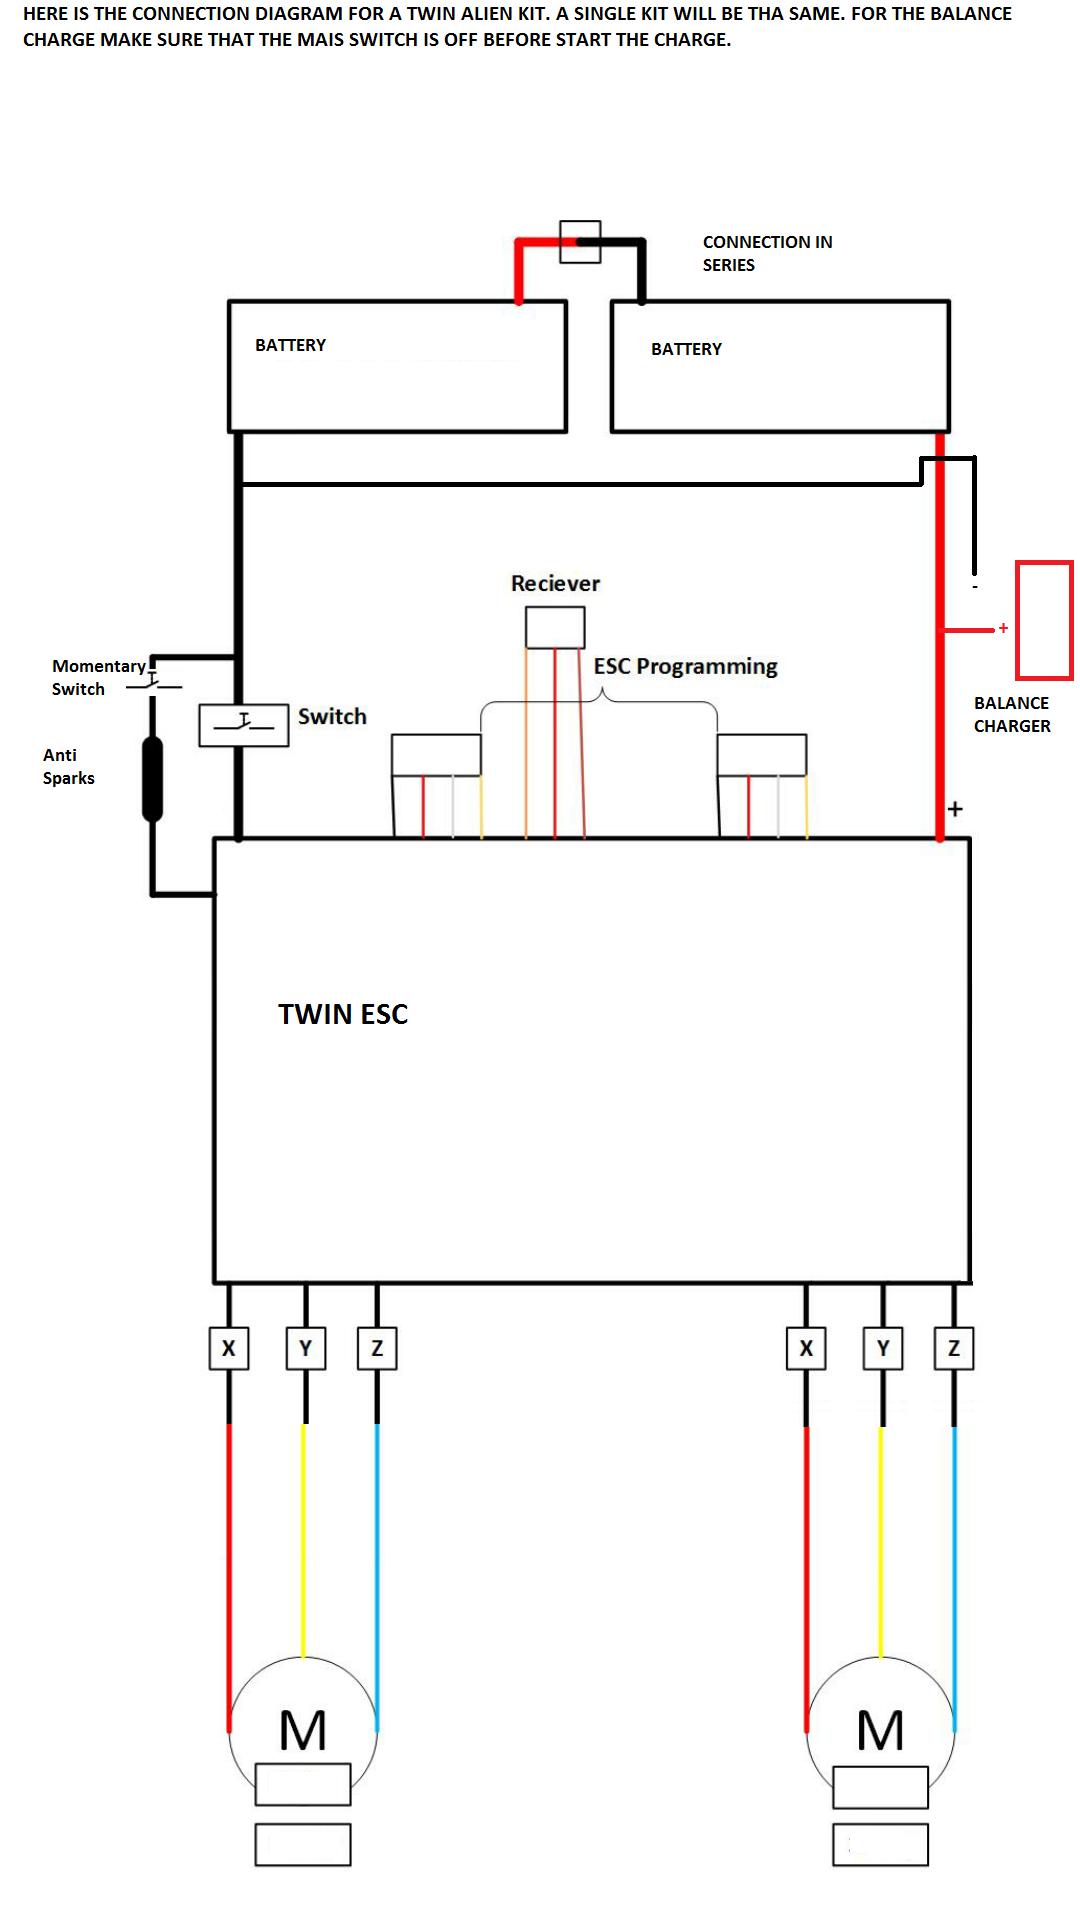 twin esc connection batteries  screenshot_2014-03-06-11-40-25